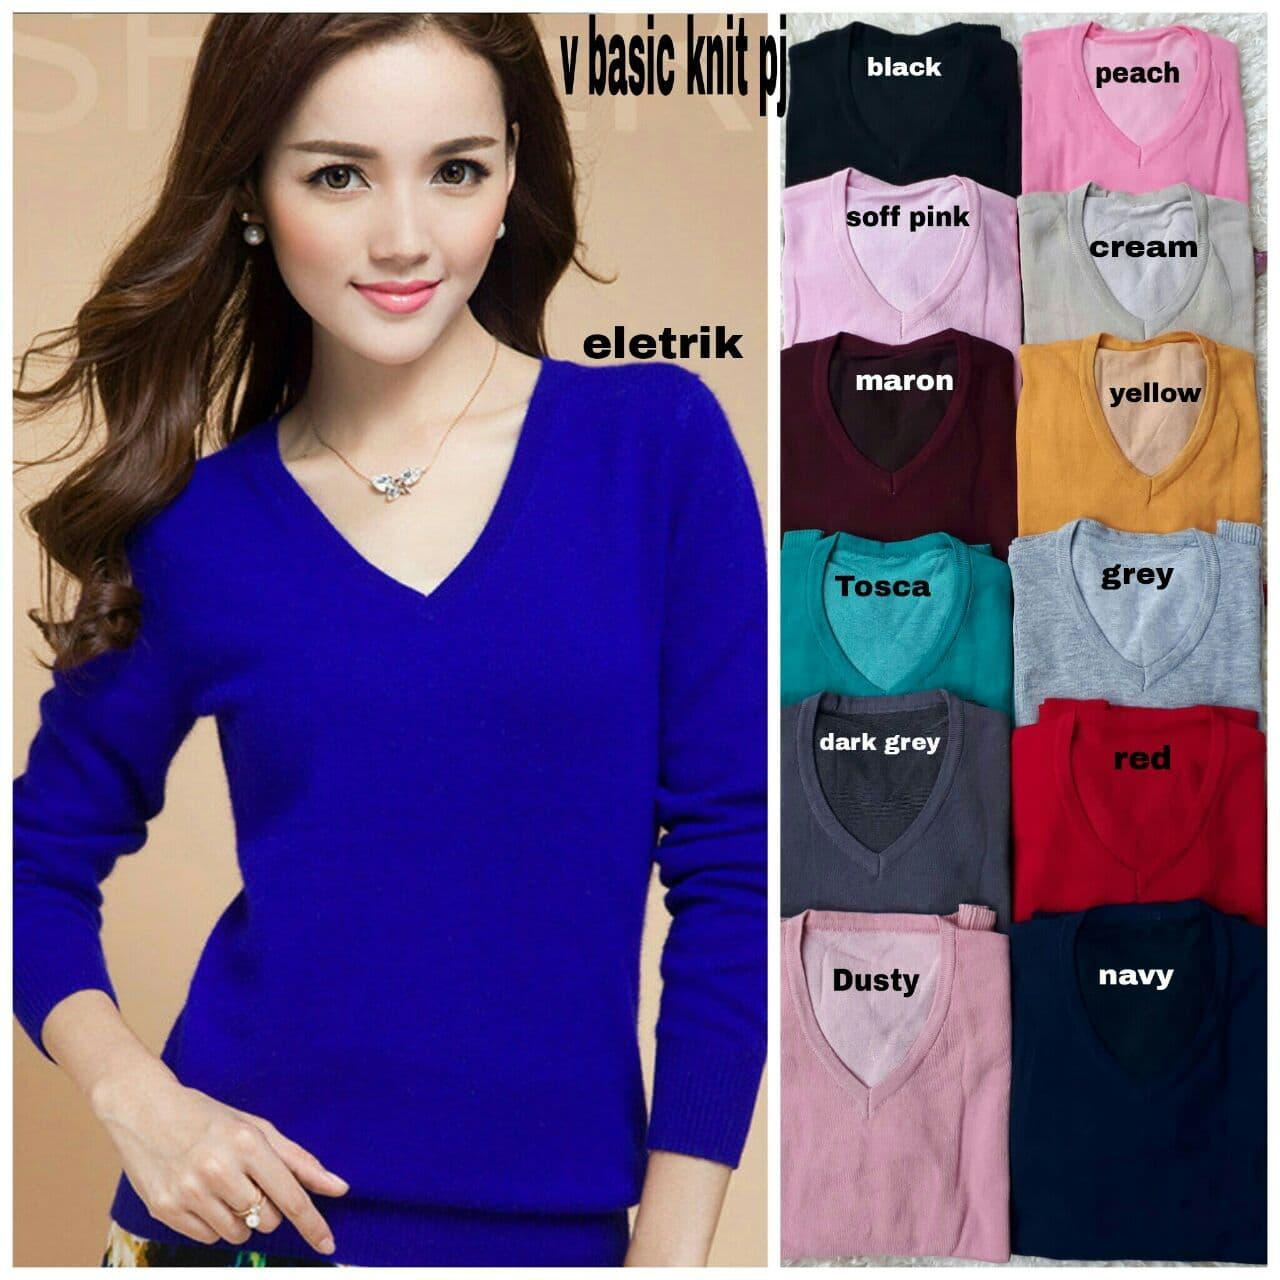 PROMO!!! [V basic knit pj RO] blouse wanita spandex var color TERMURAH KEMEJA / HIJAB / KAOS / PASHMINA / MUKENA / SYARI